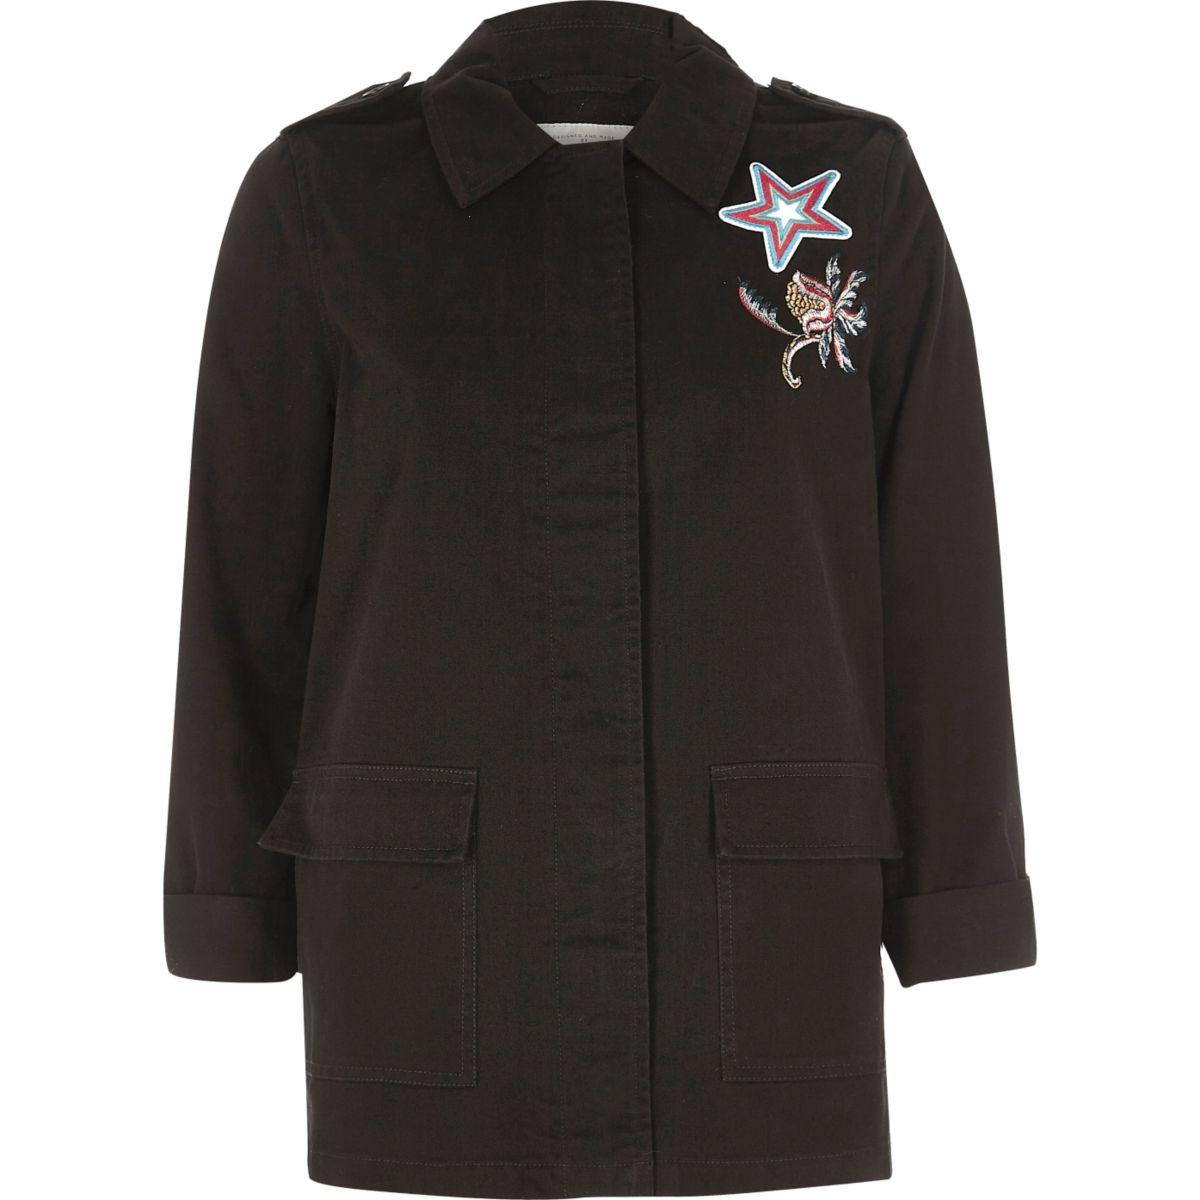 Black troublemaker print army jacket